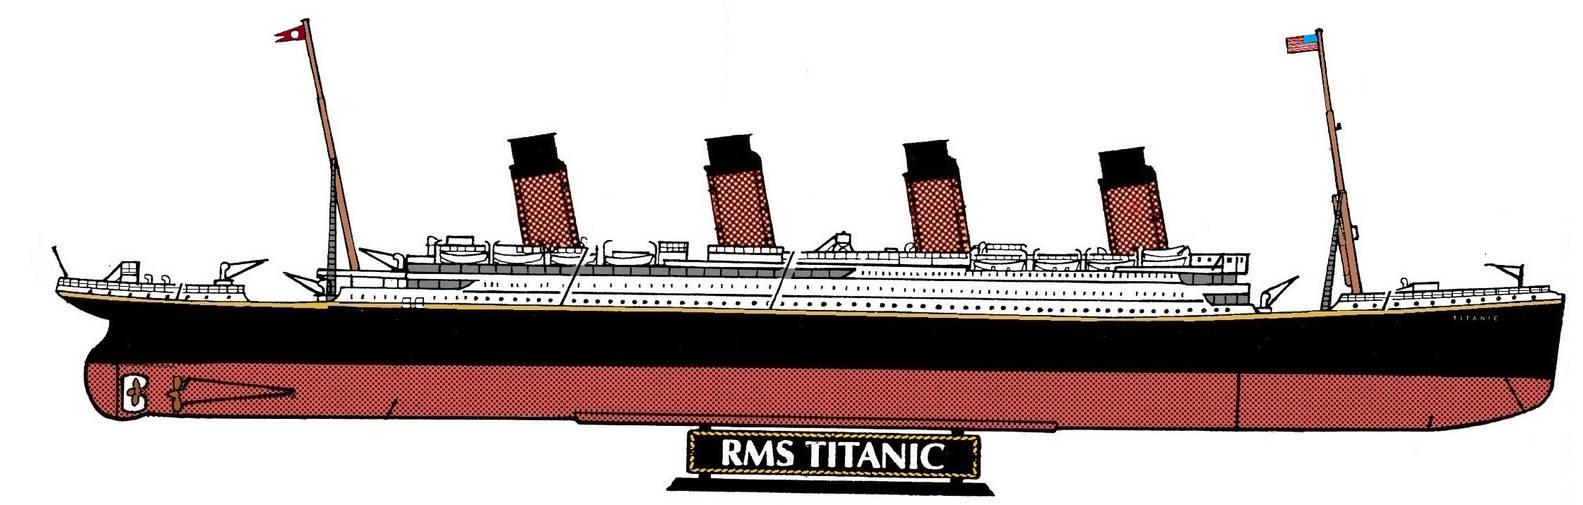 Titanic Revell 1-1200 Instructions by SebastianMerman on DeviantArt